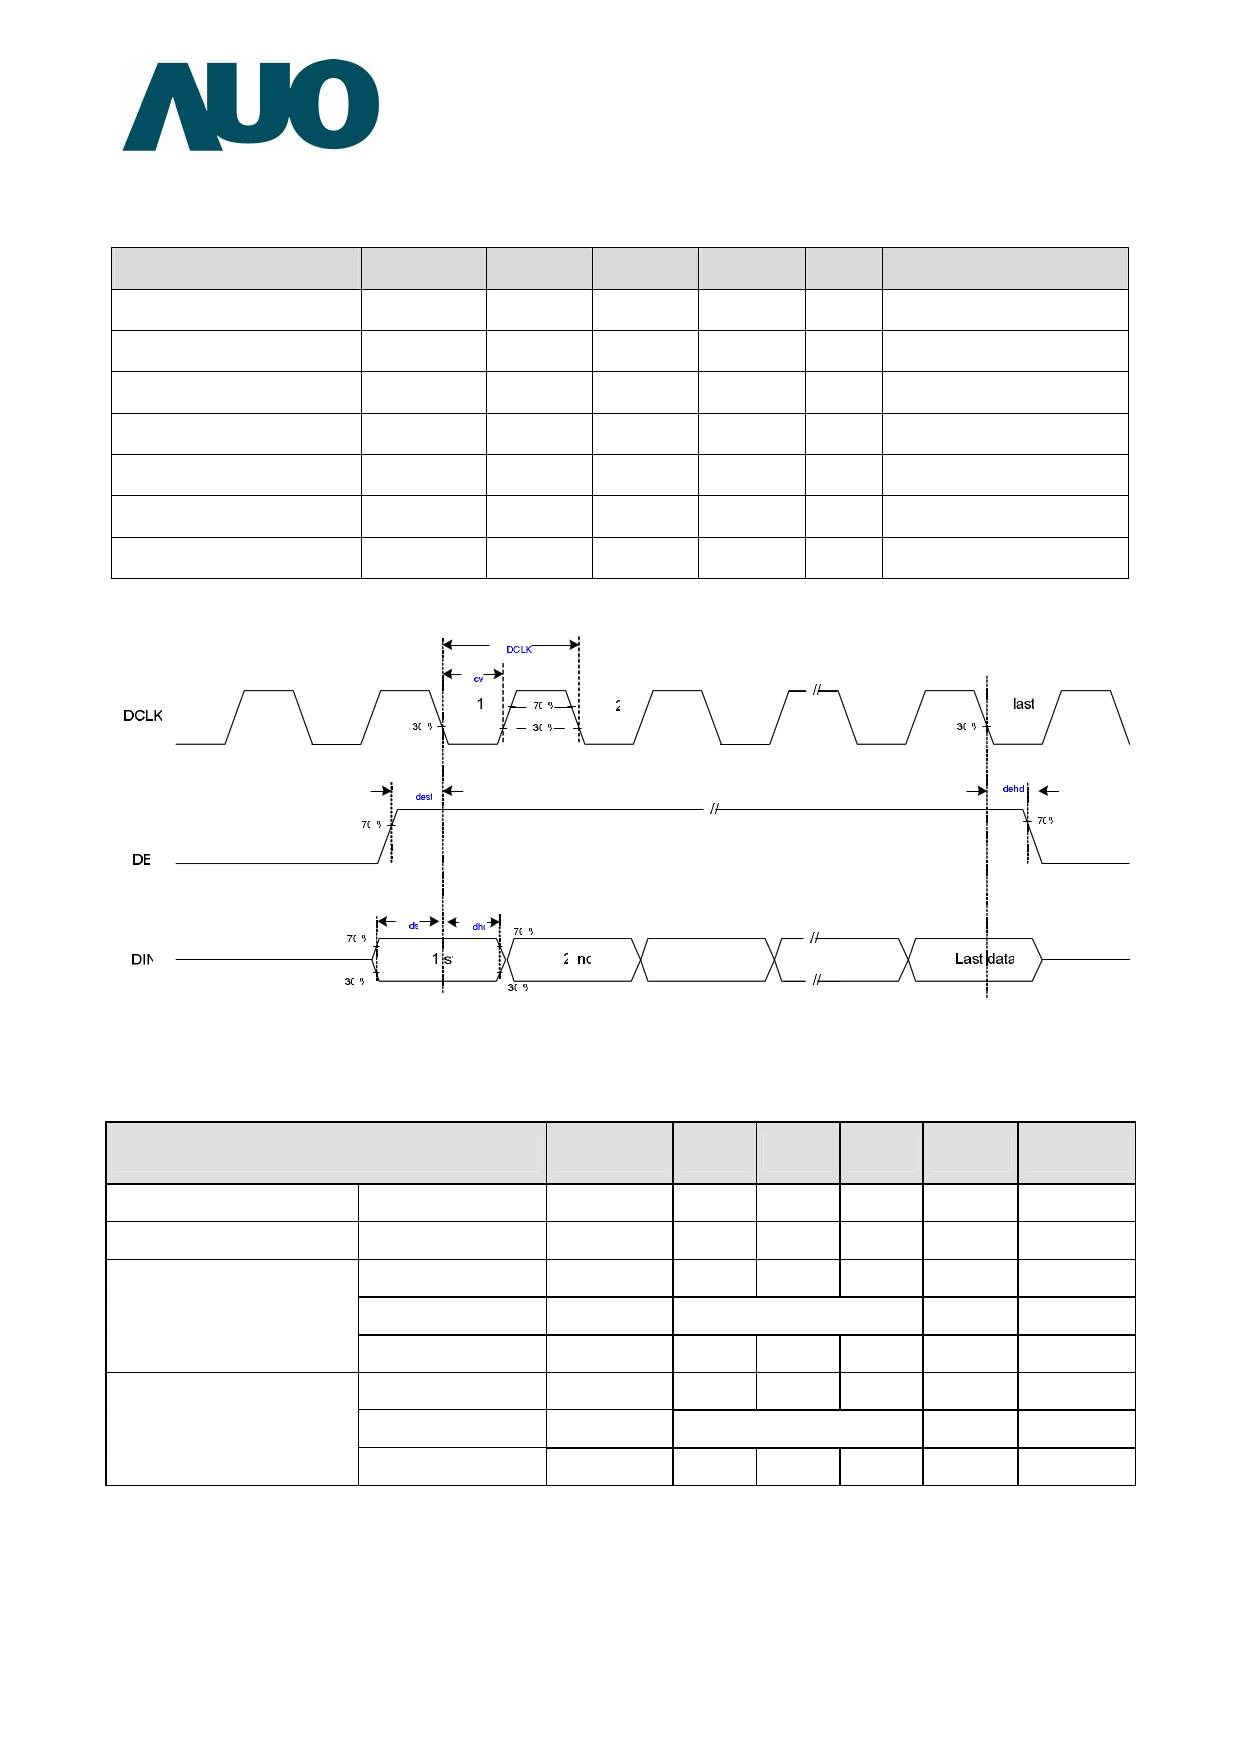 G043FTT01.0 arduino